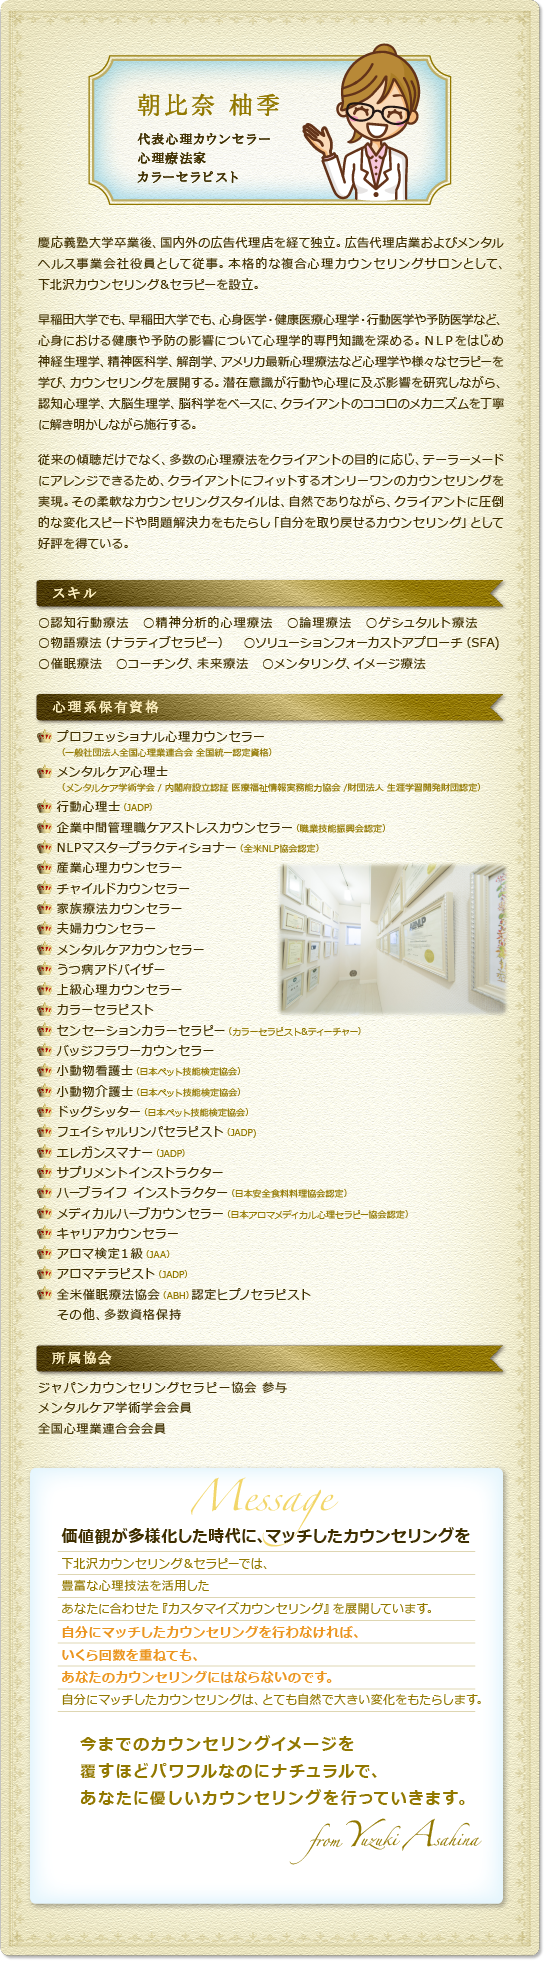 tokyo_setagaya_shimokitszawa_counseling_therapy_coaching387